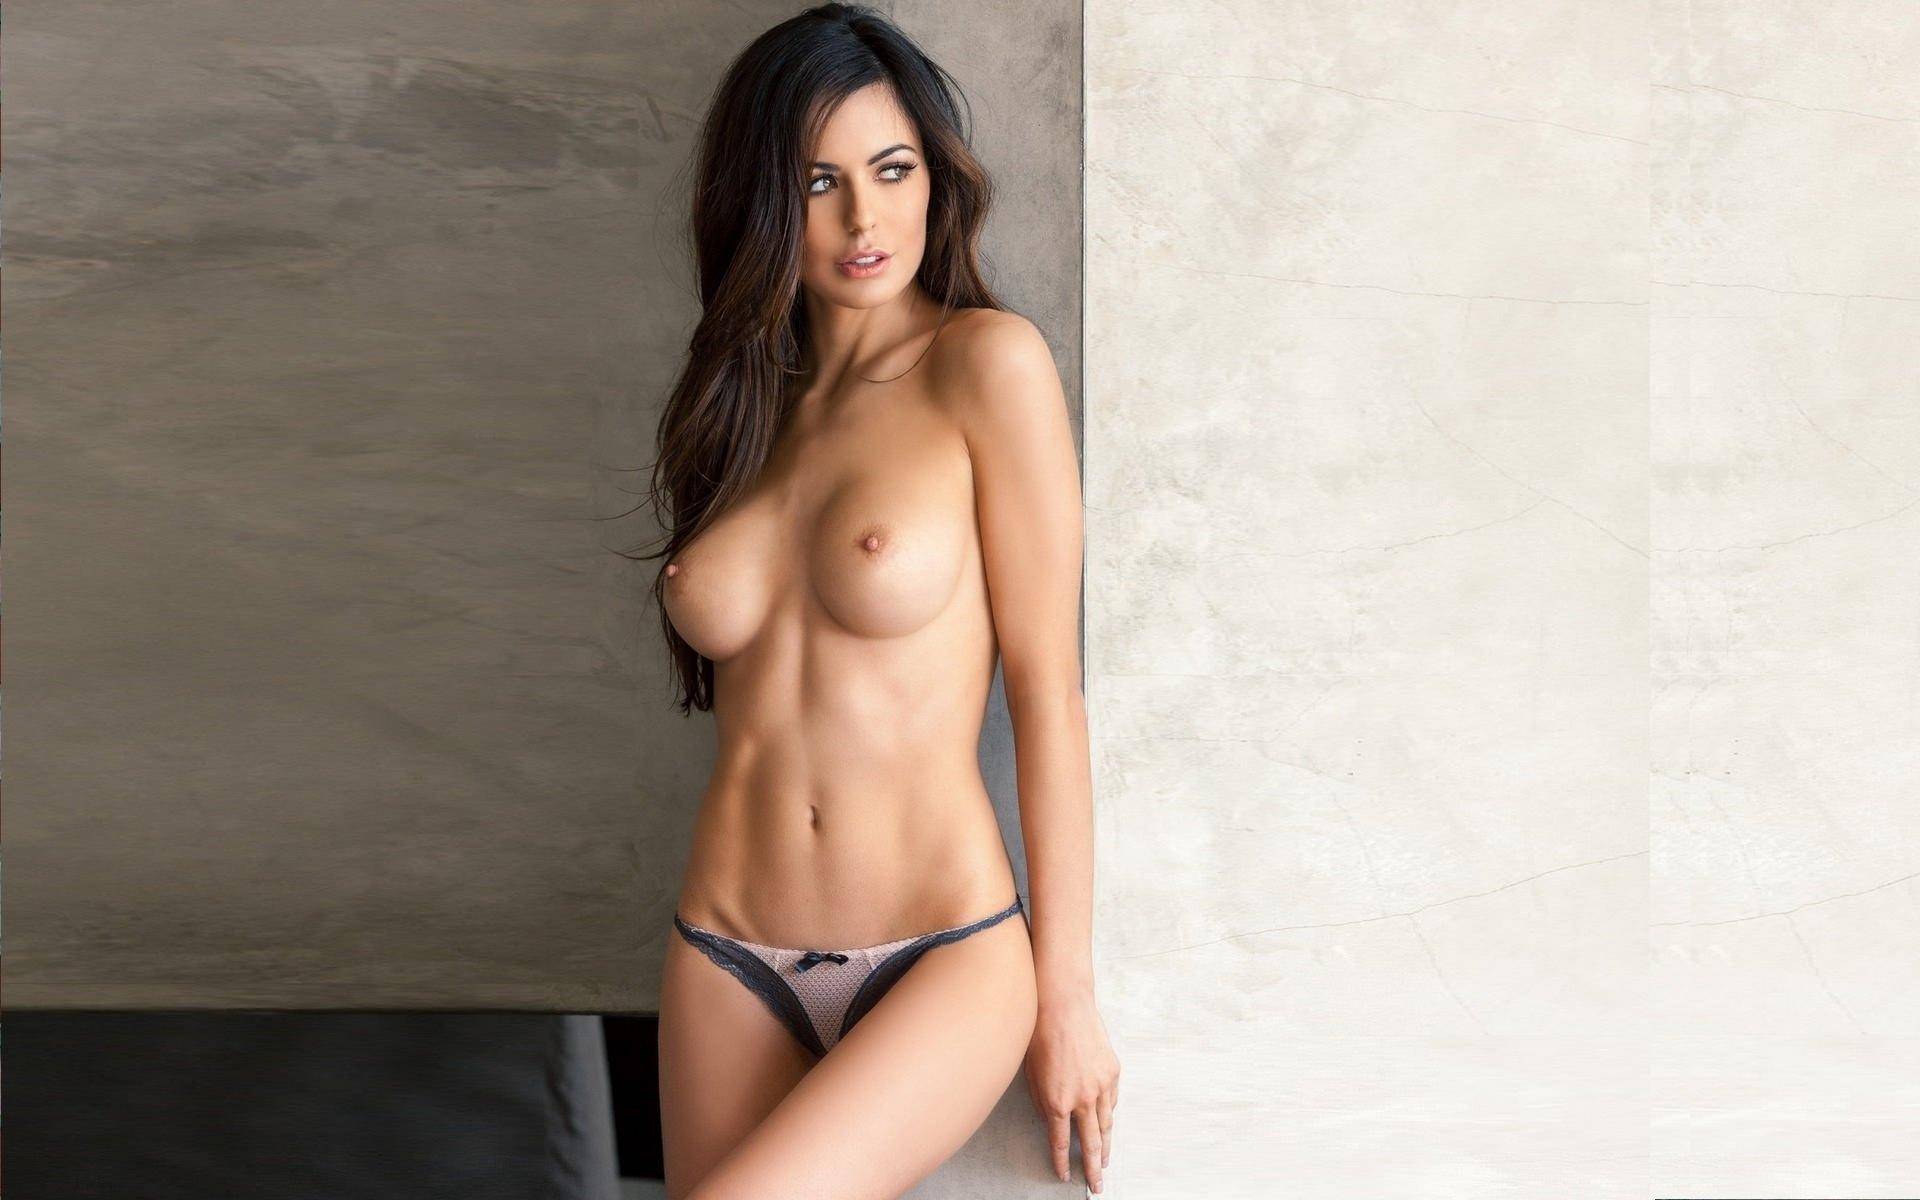 Красивая брюнетка голая